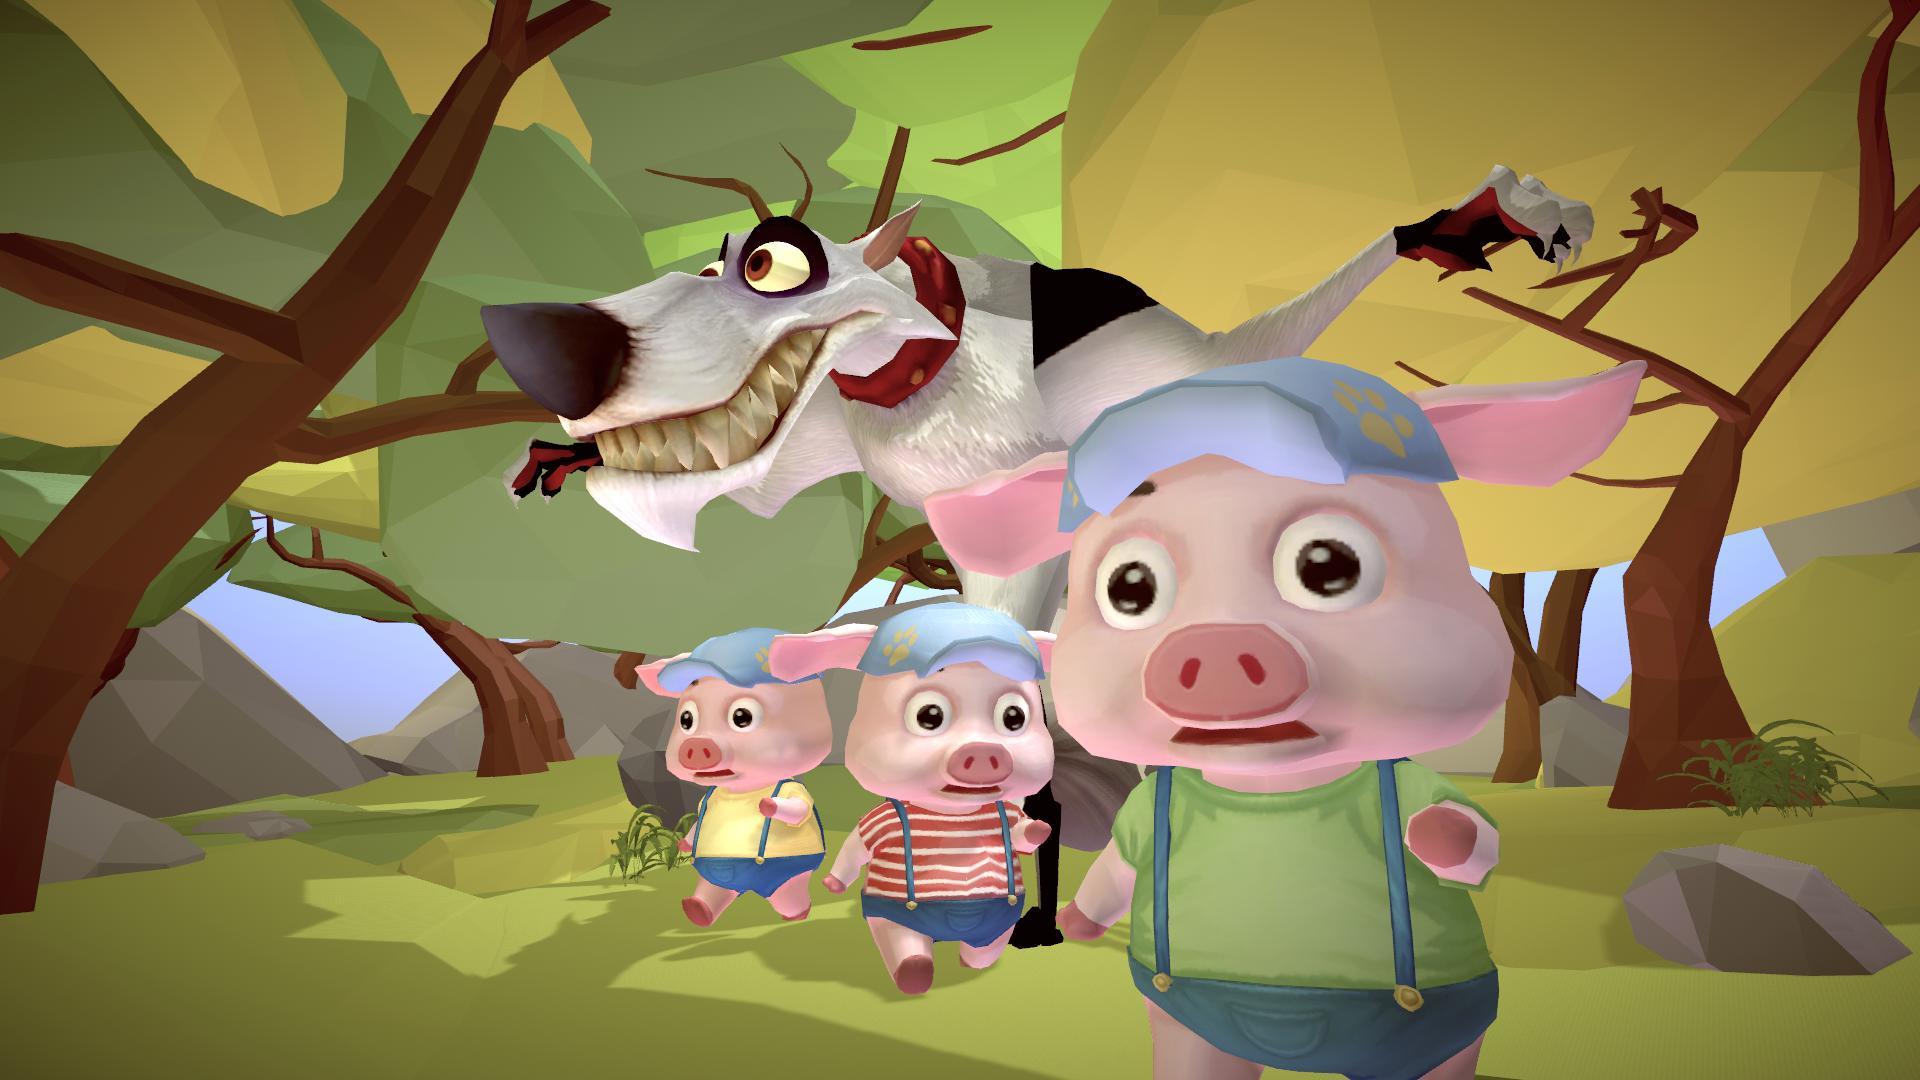 [MWU Korea 2019] AR Fairy Tale Book - the three pigs / FMA Lab